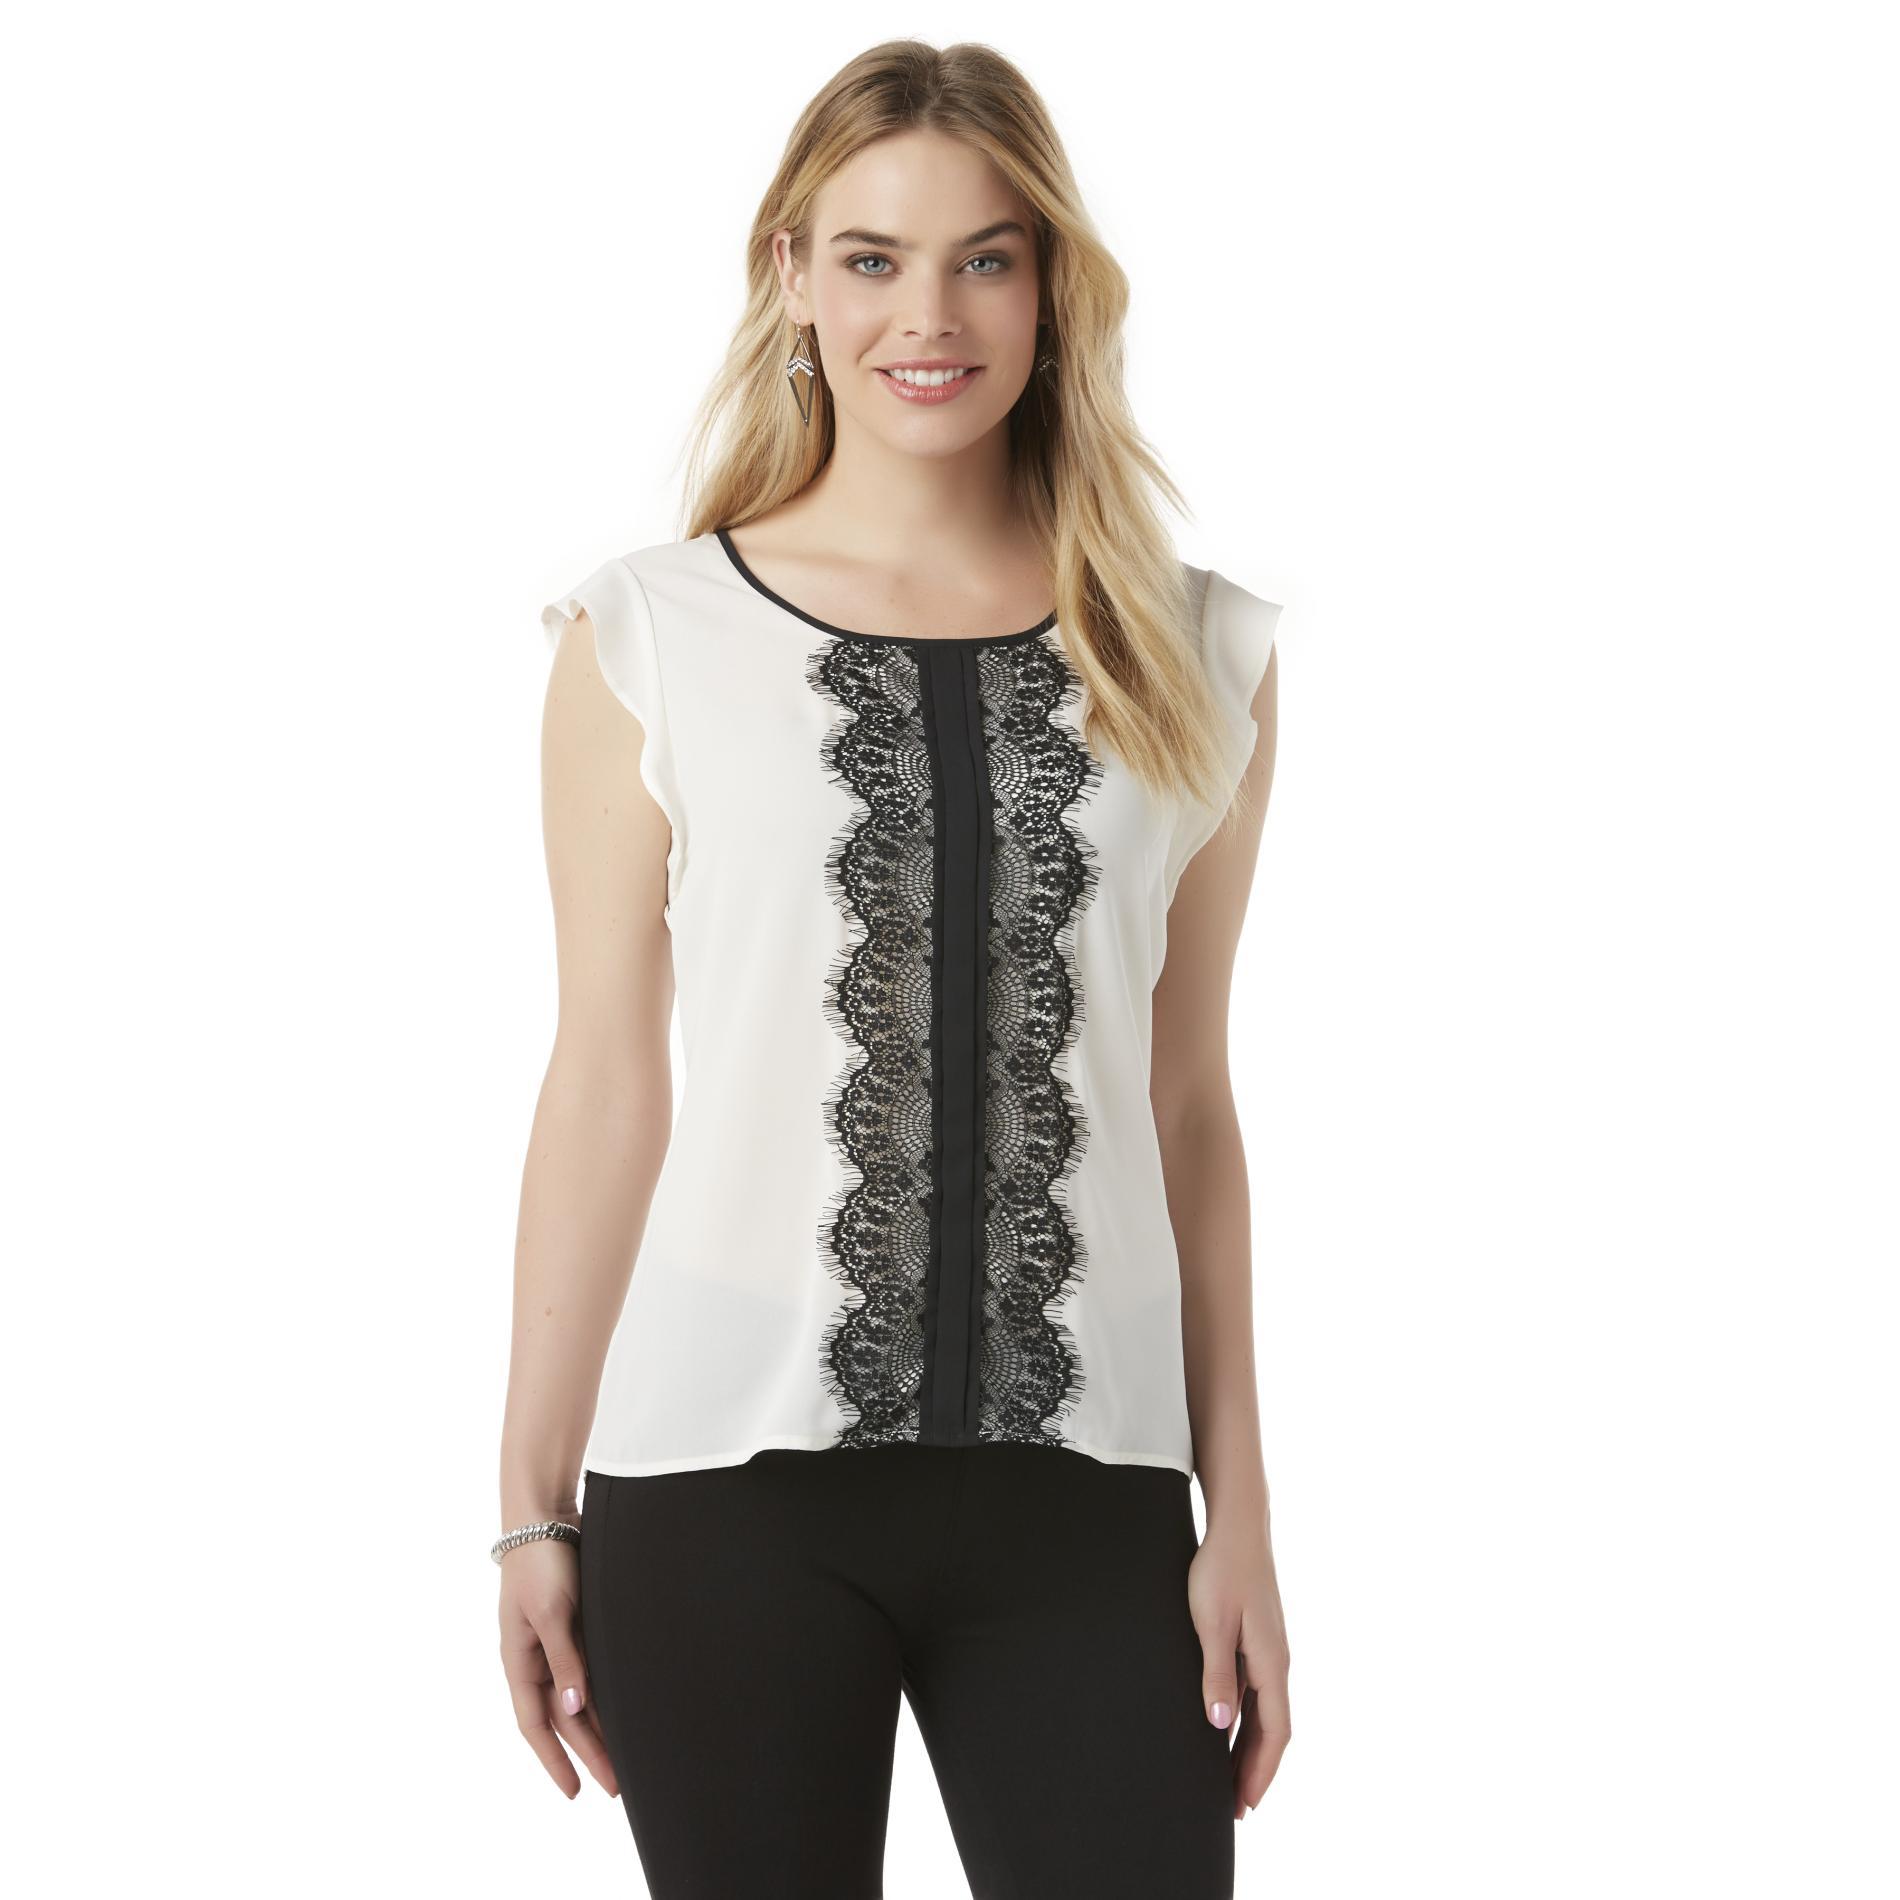 Women's Flutter-Sleeve Blouse - Lace